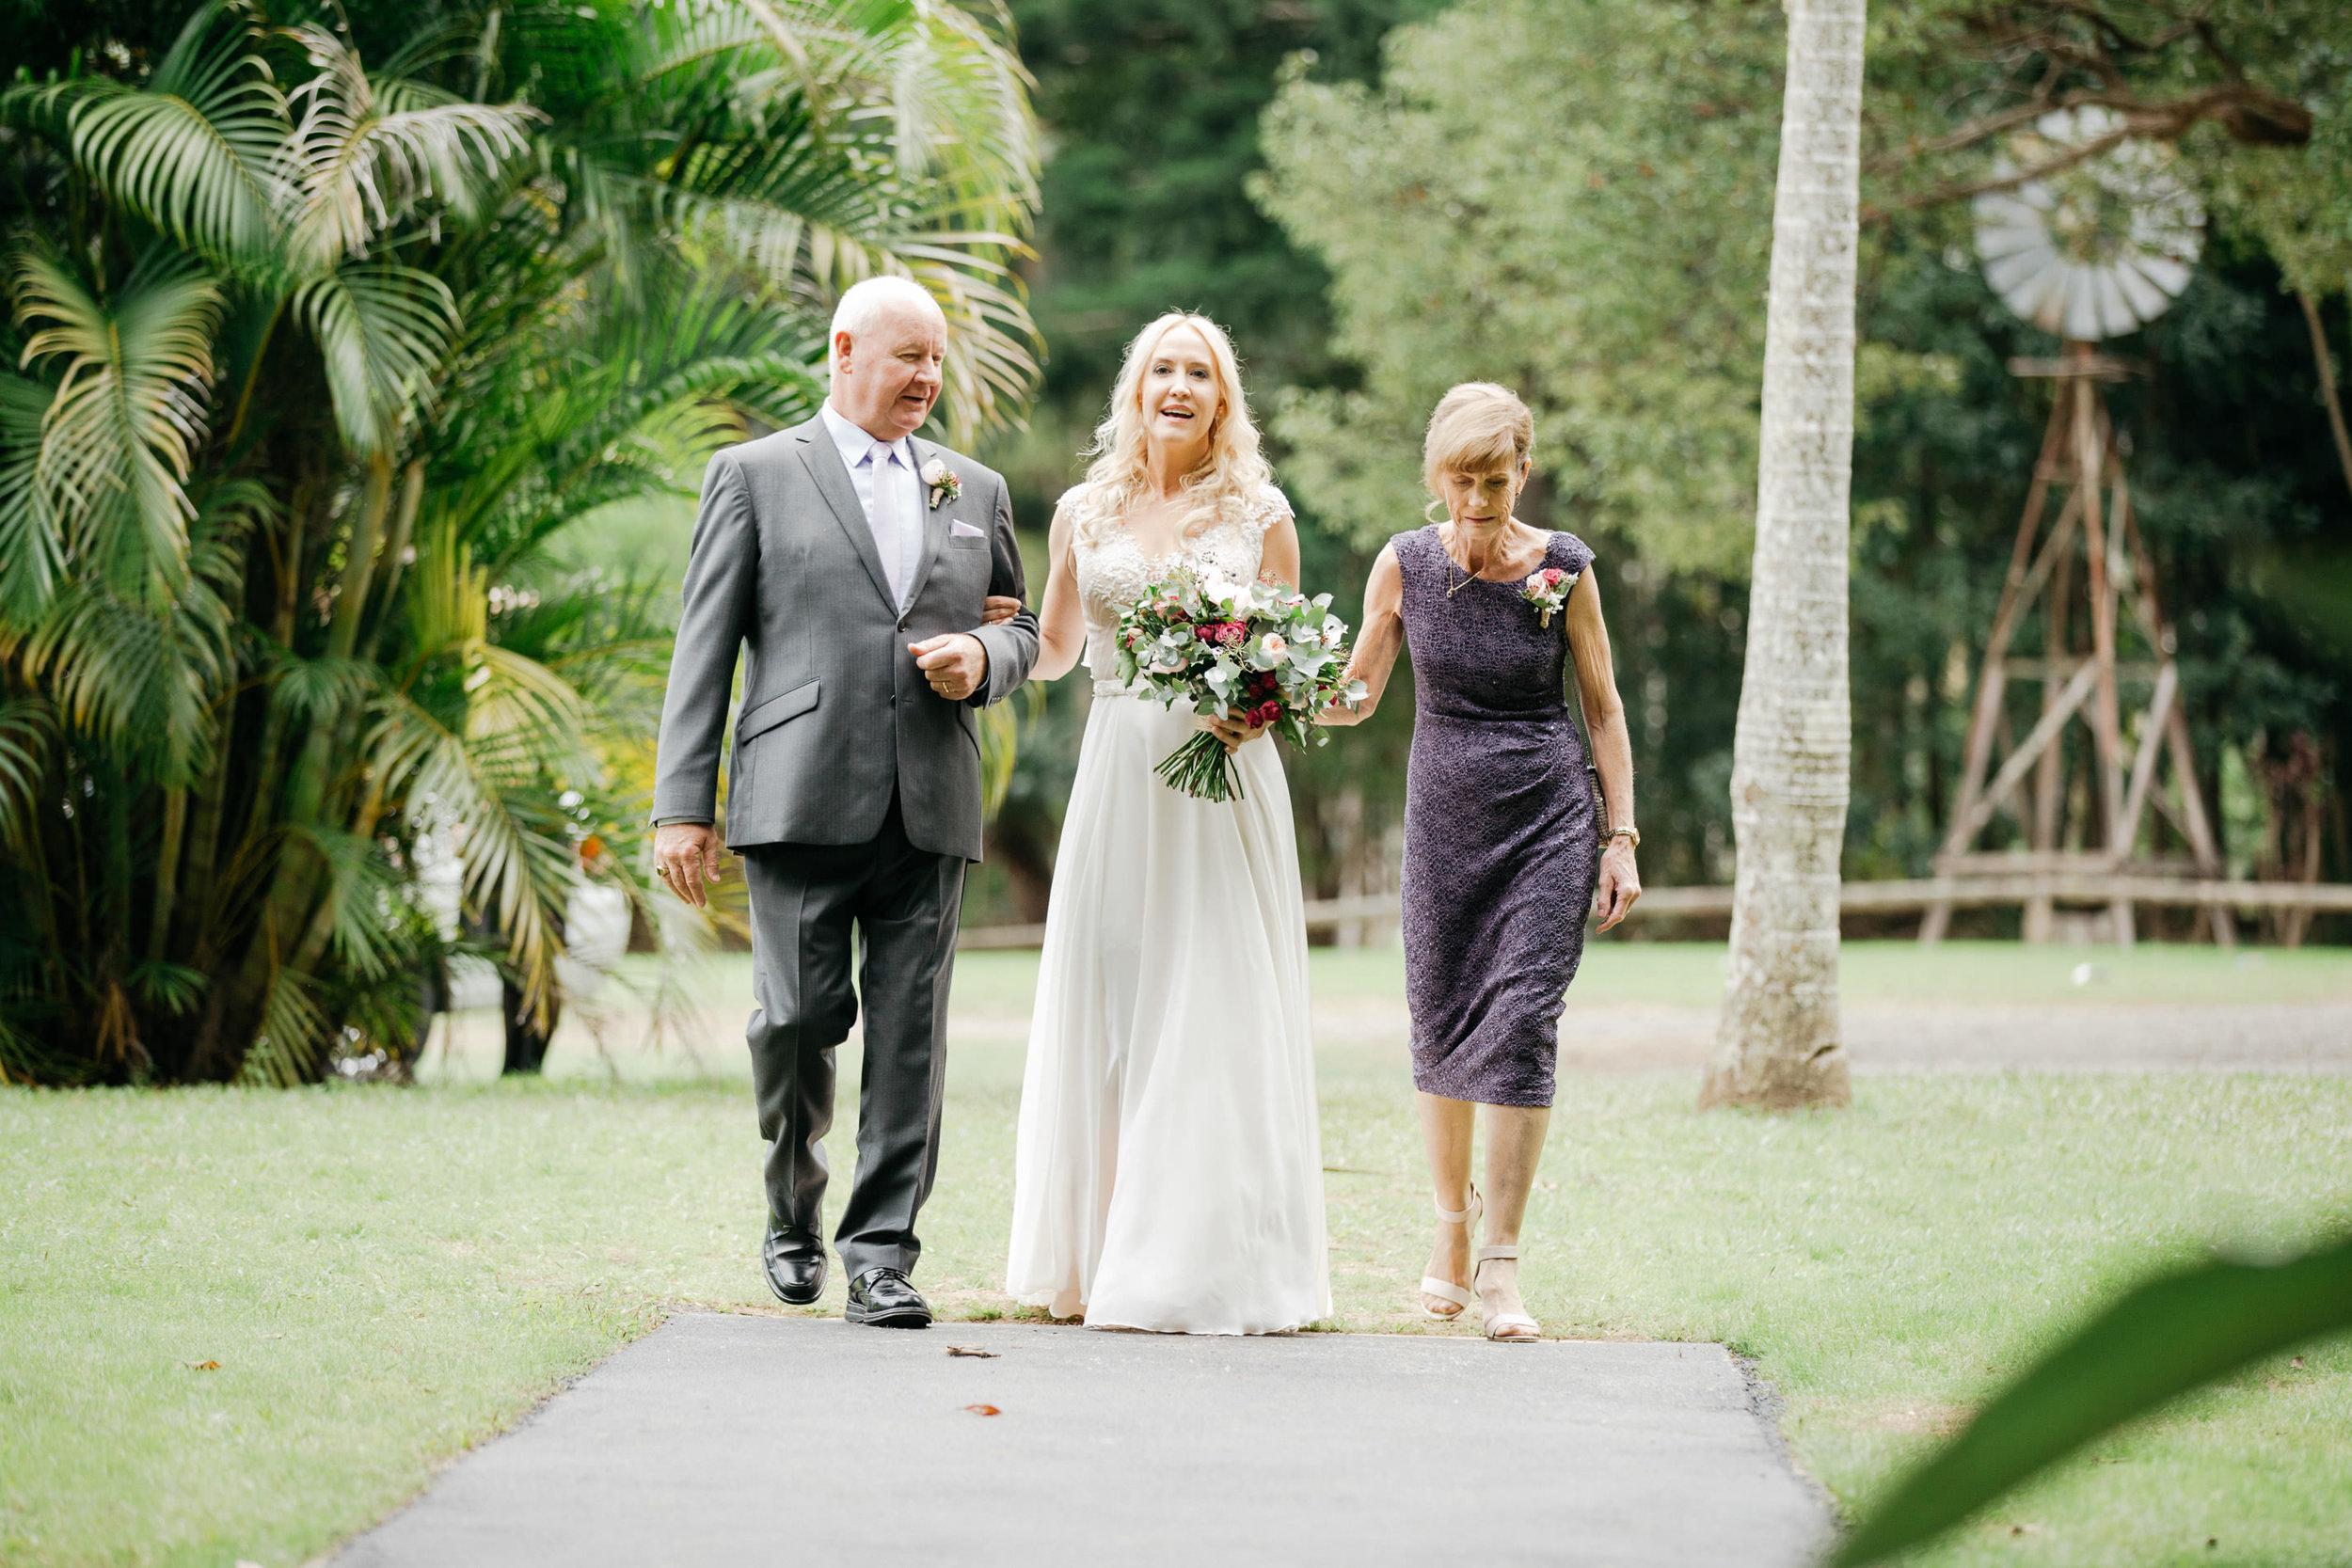 True North Photography_Boomerang Farm_Stacey and Isaac_Gold Coast Wedding_Barm Wedding_Hinterland Wedding-76.jpg